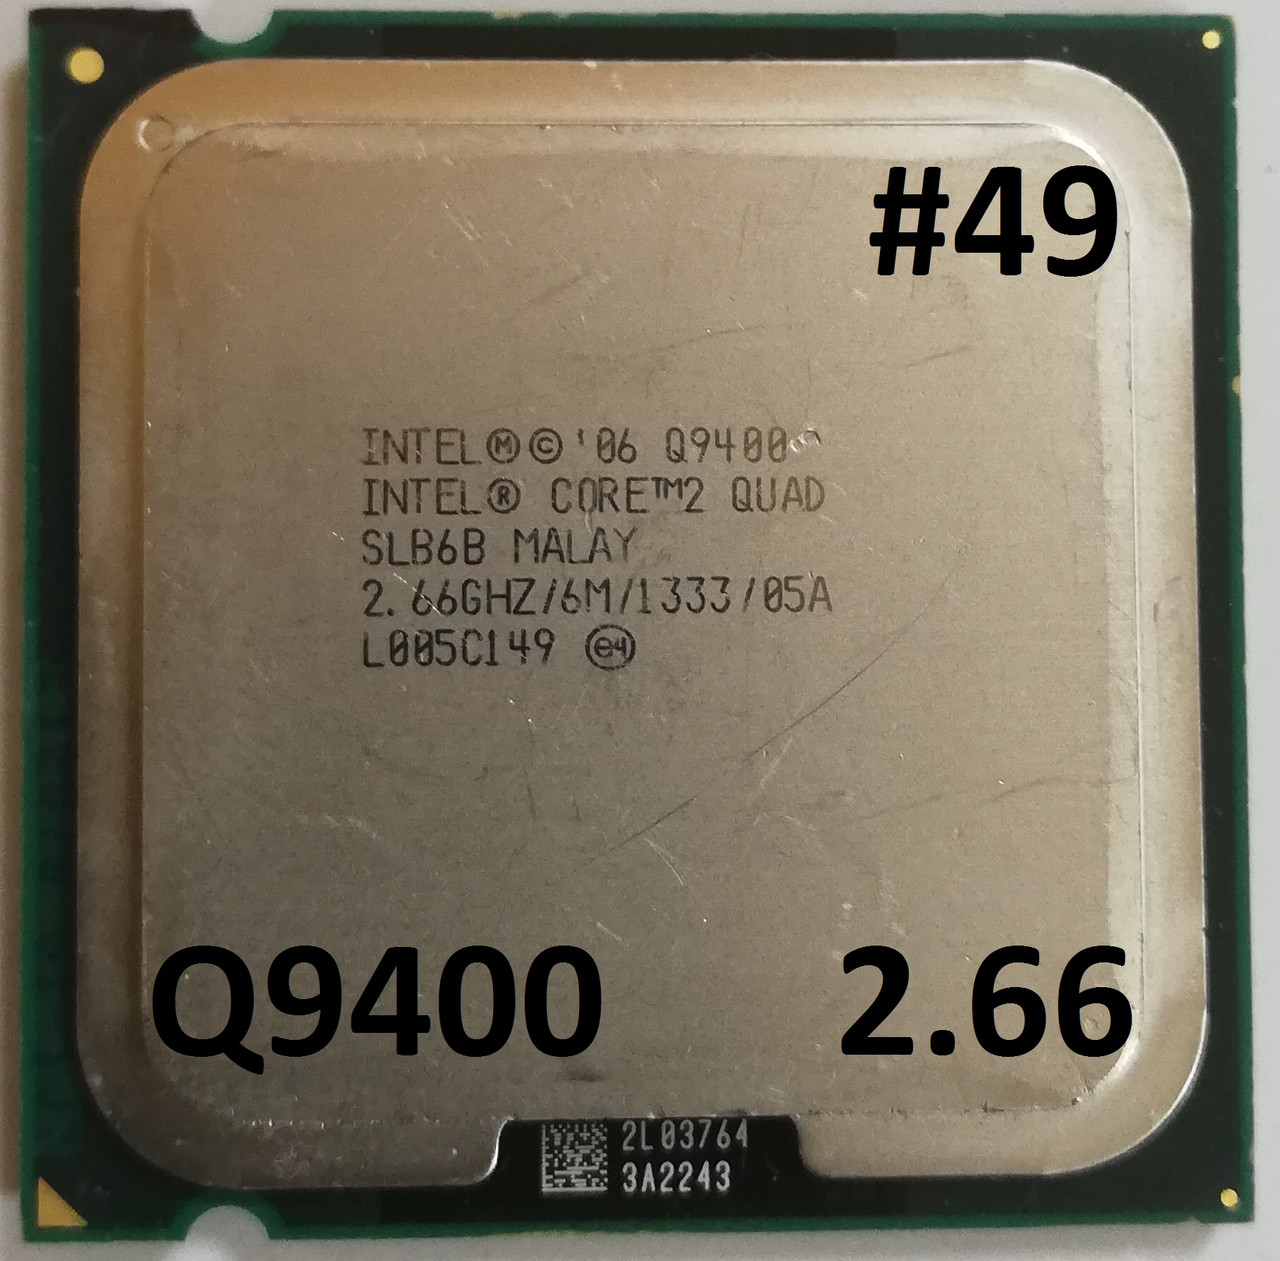 Процессор  ЛОТ #49 Intel® Core™2 Quad Q9400 R0 SLB6B 2.66GHz 6M Cache 1333 MHz FSB Soket 775 Б/У